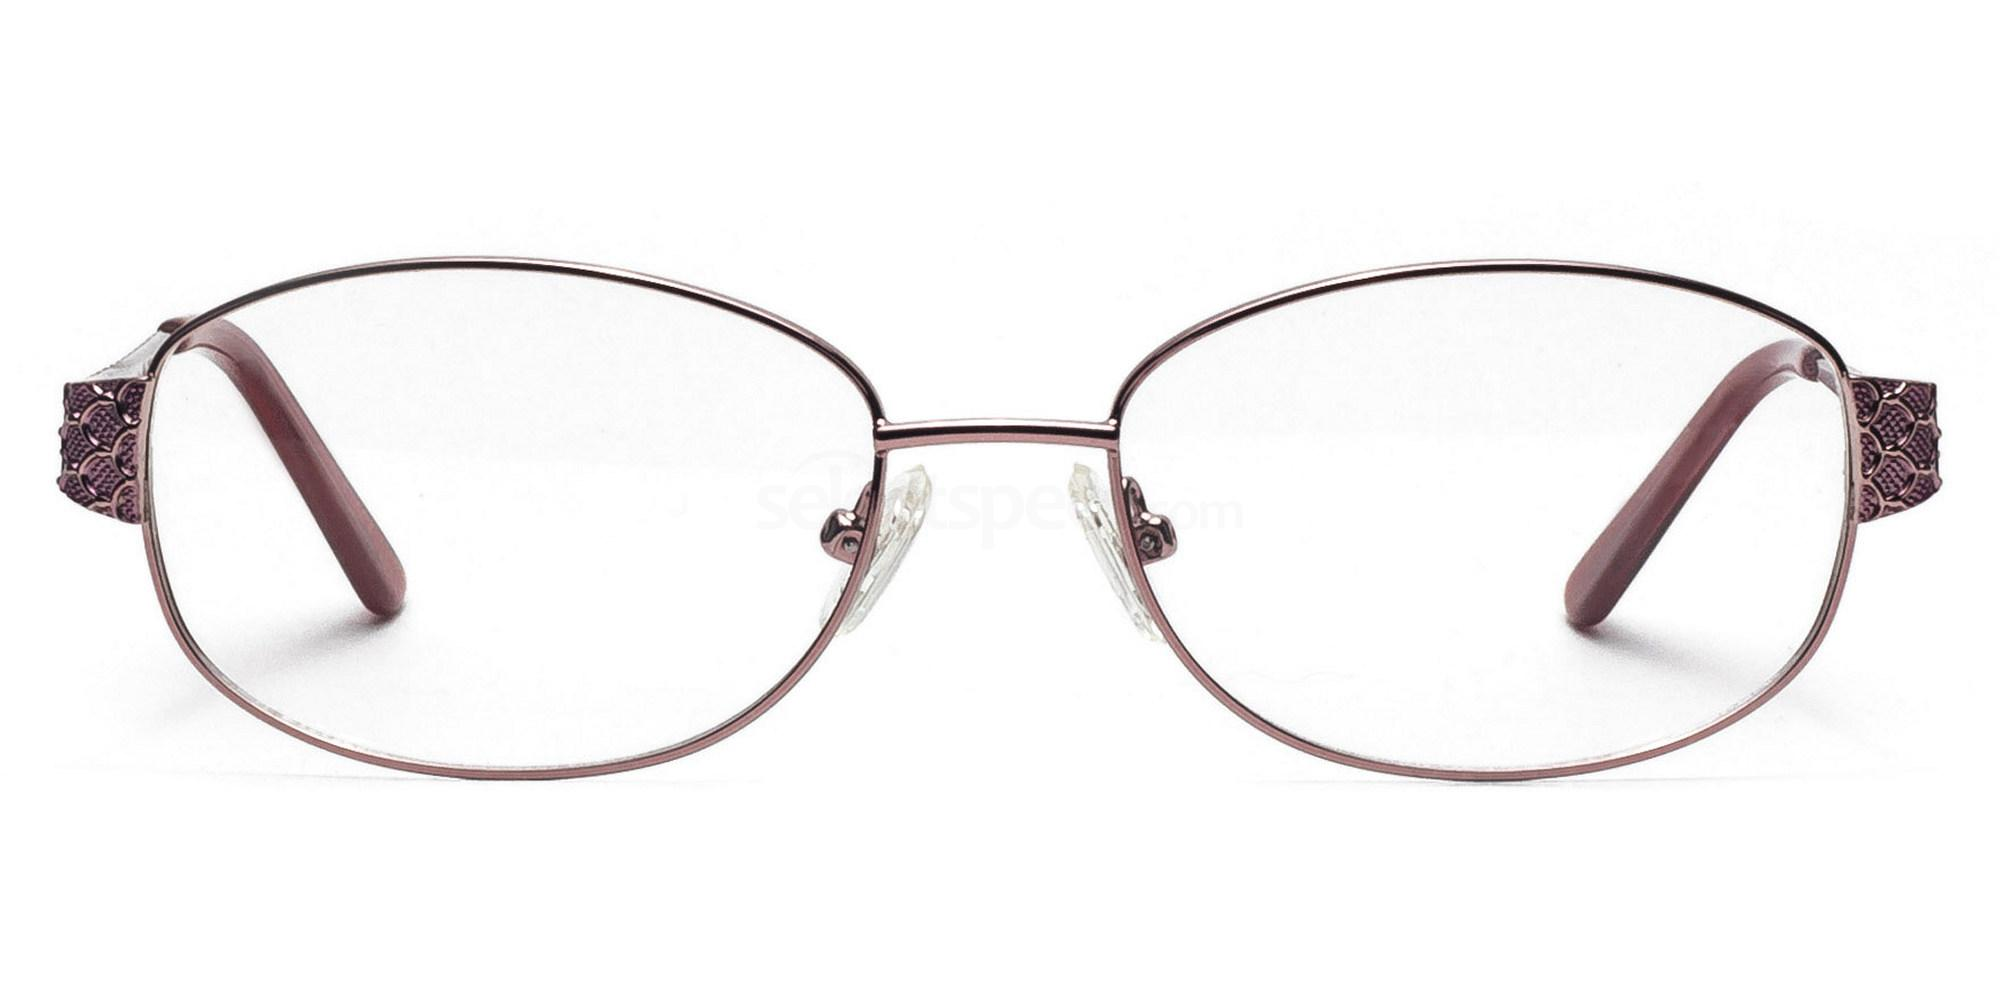 C1 SRM004 Glasses, SelectSpecs